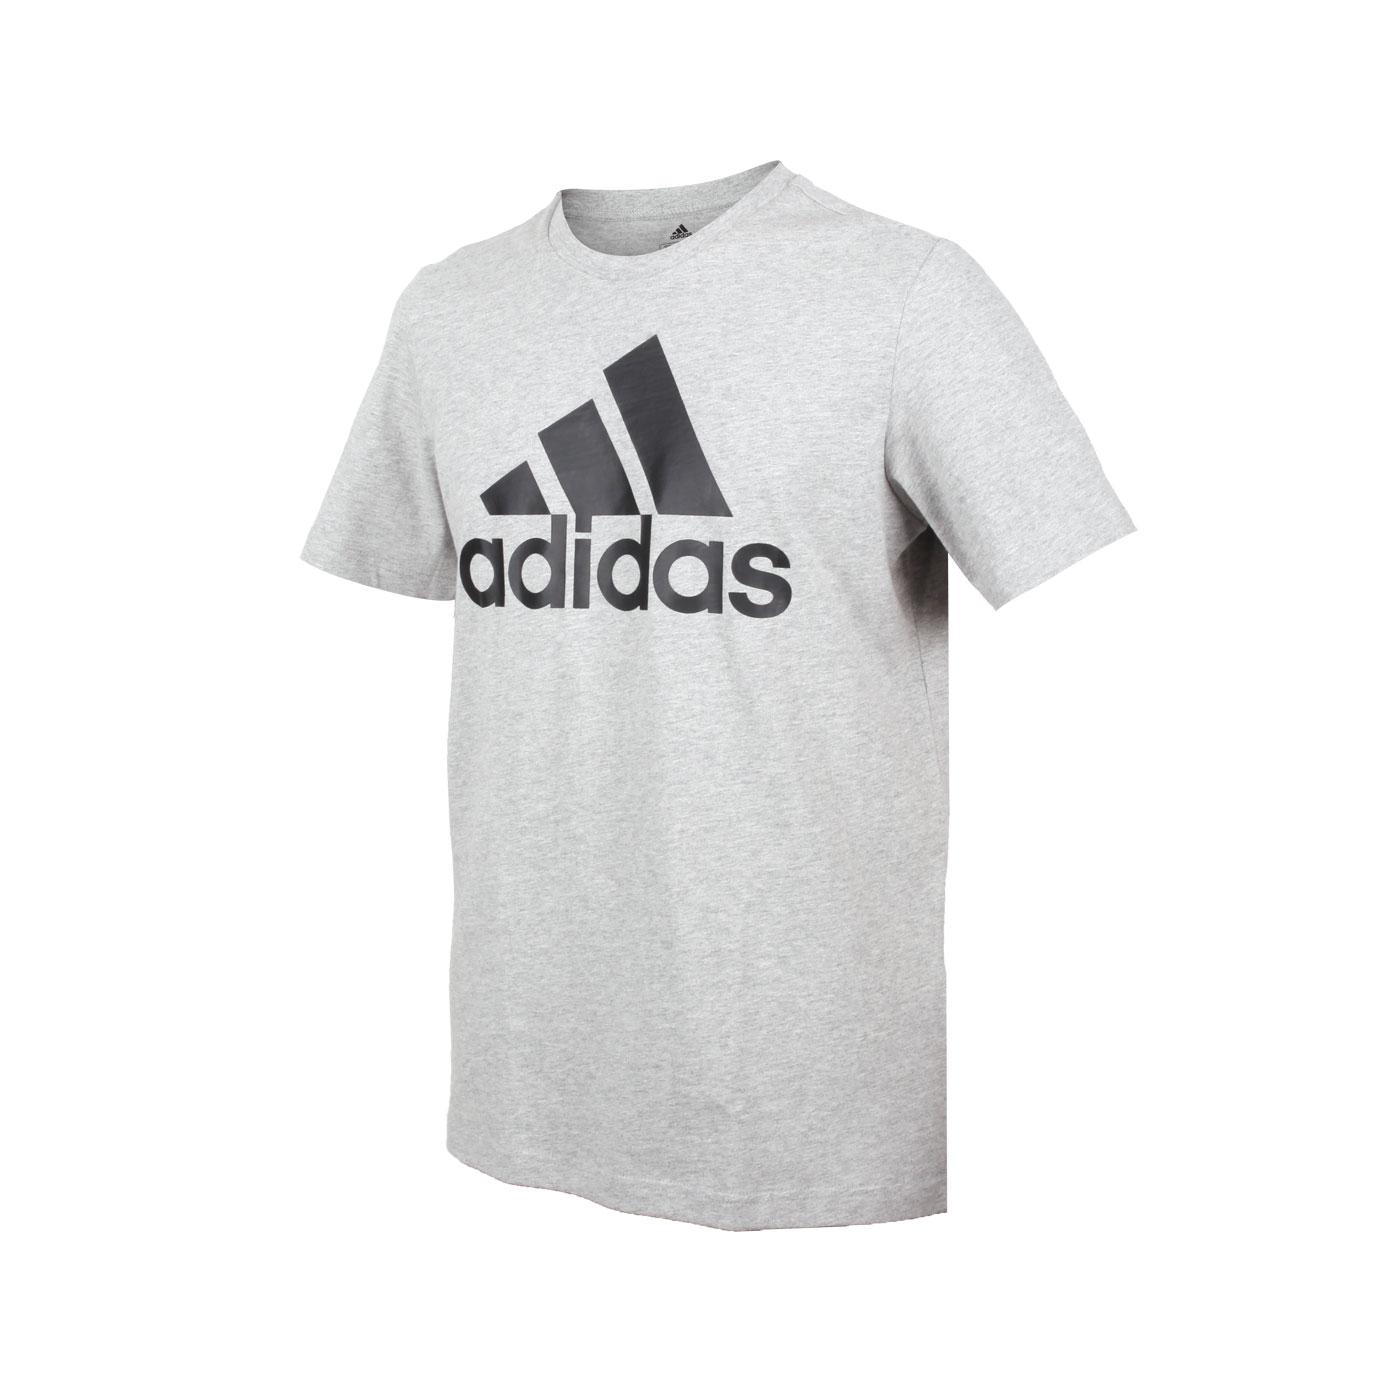 ADIDAS 男款短袖T恤 GK9123 - 灰黑